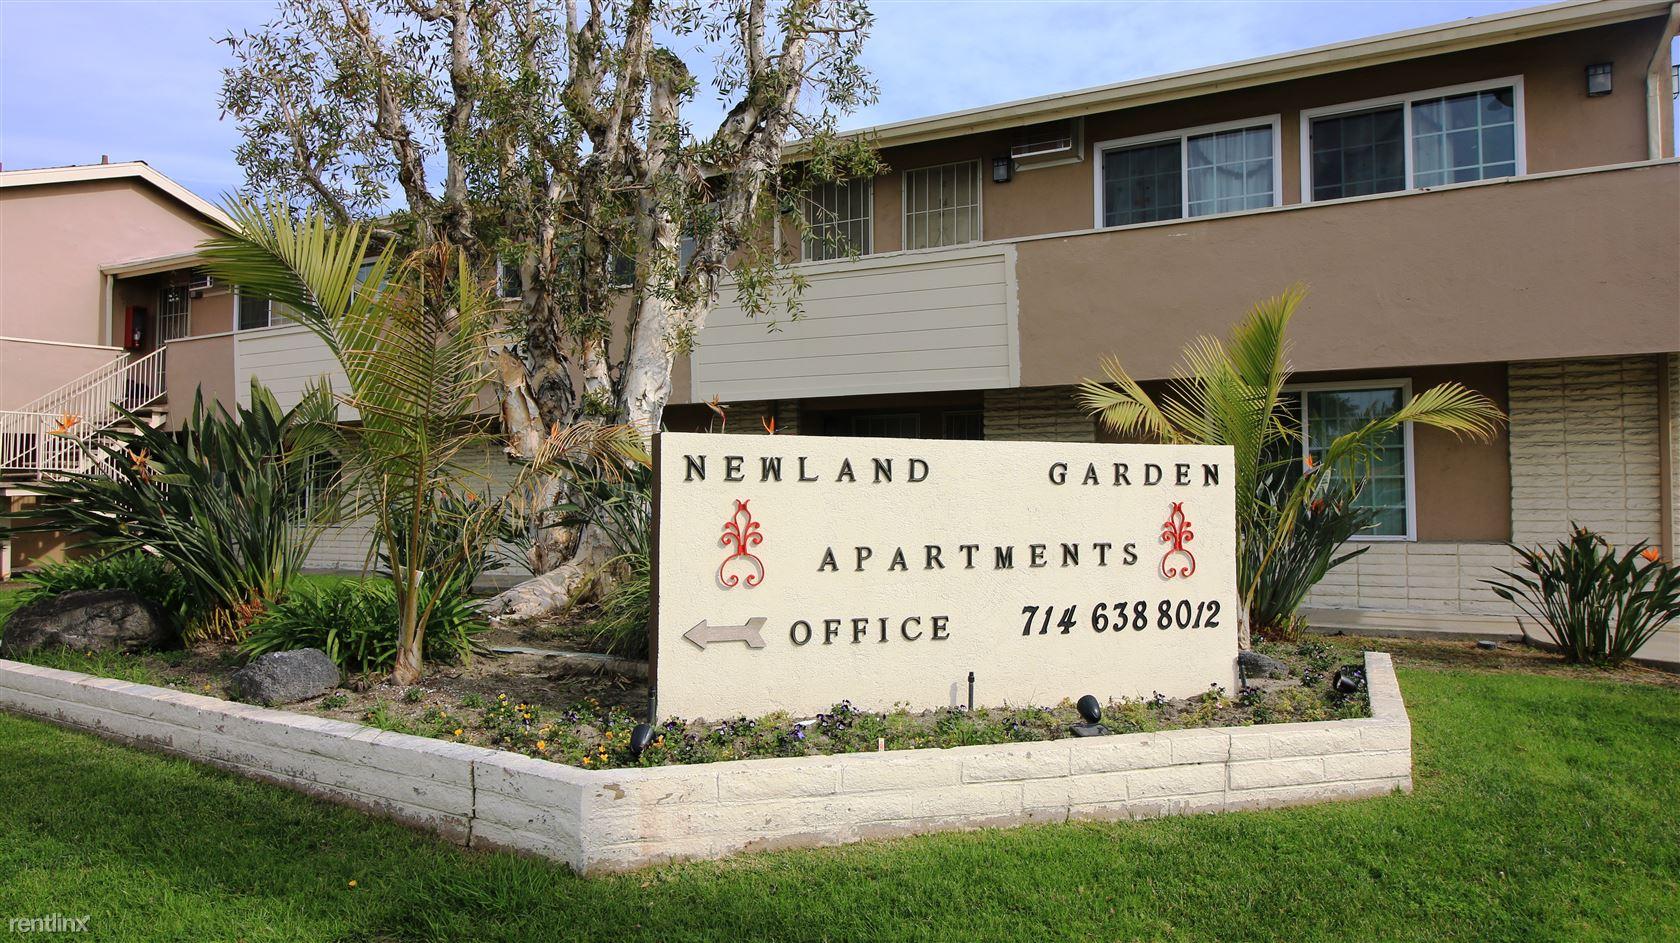 8520 Gloria Ave, Garden Grove, CA - $1,950 USD/ month